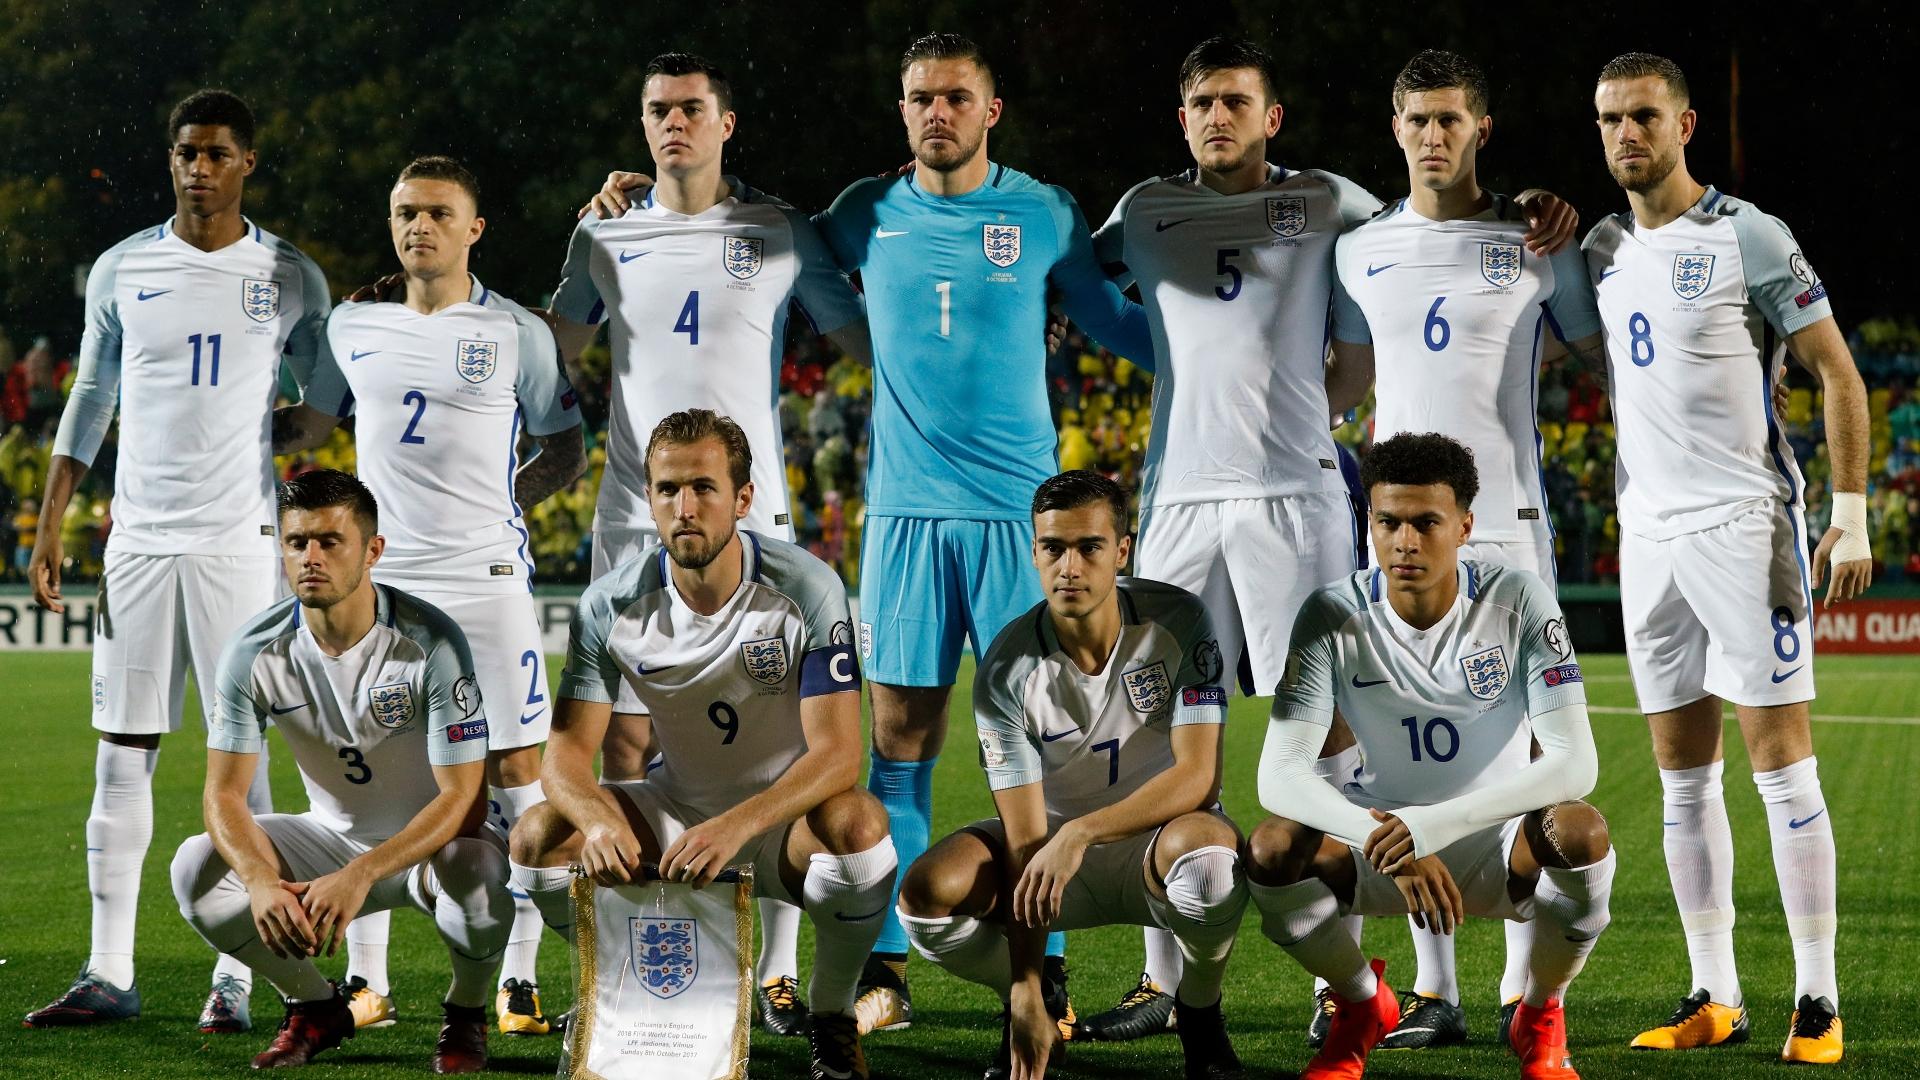 England-squad-photo_nydjmhejoync1j6e28e9hjq37